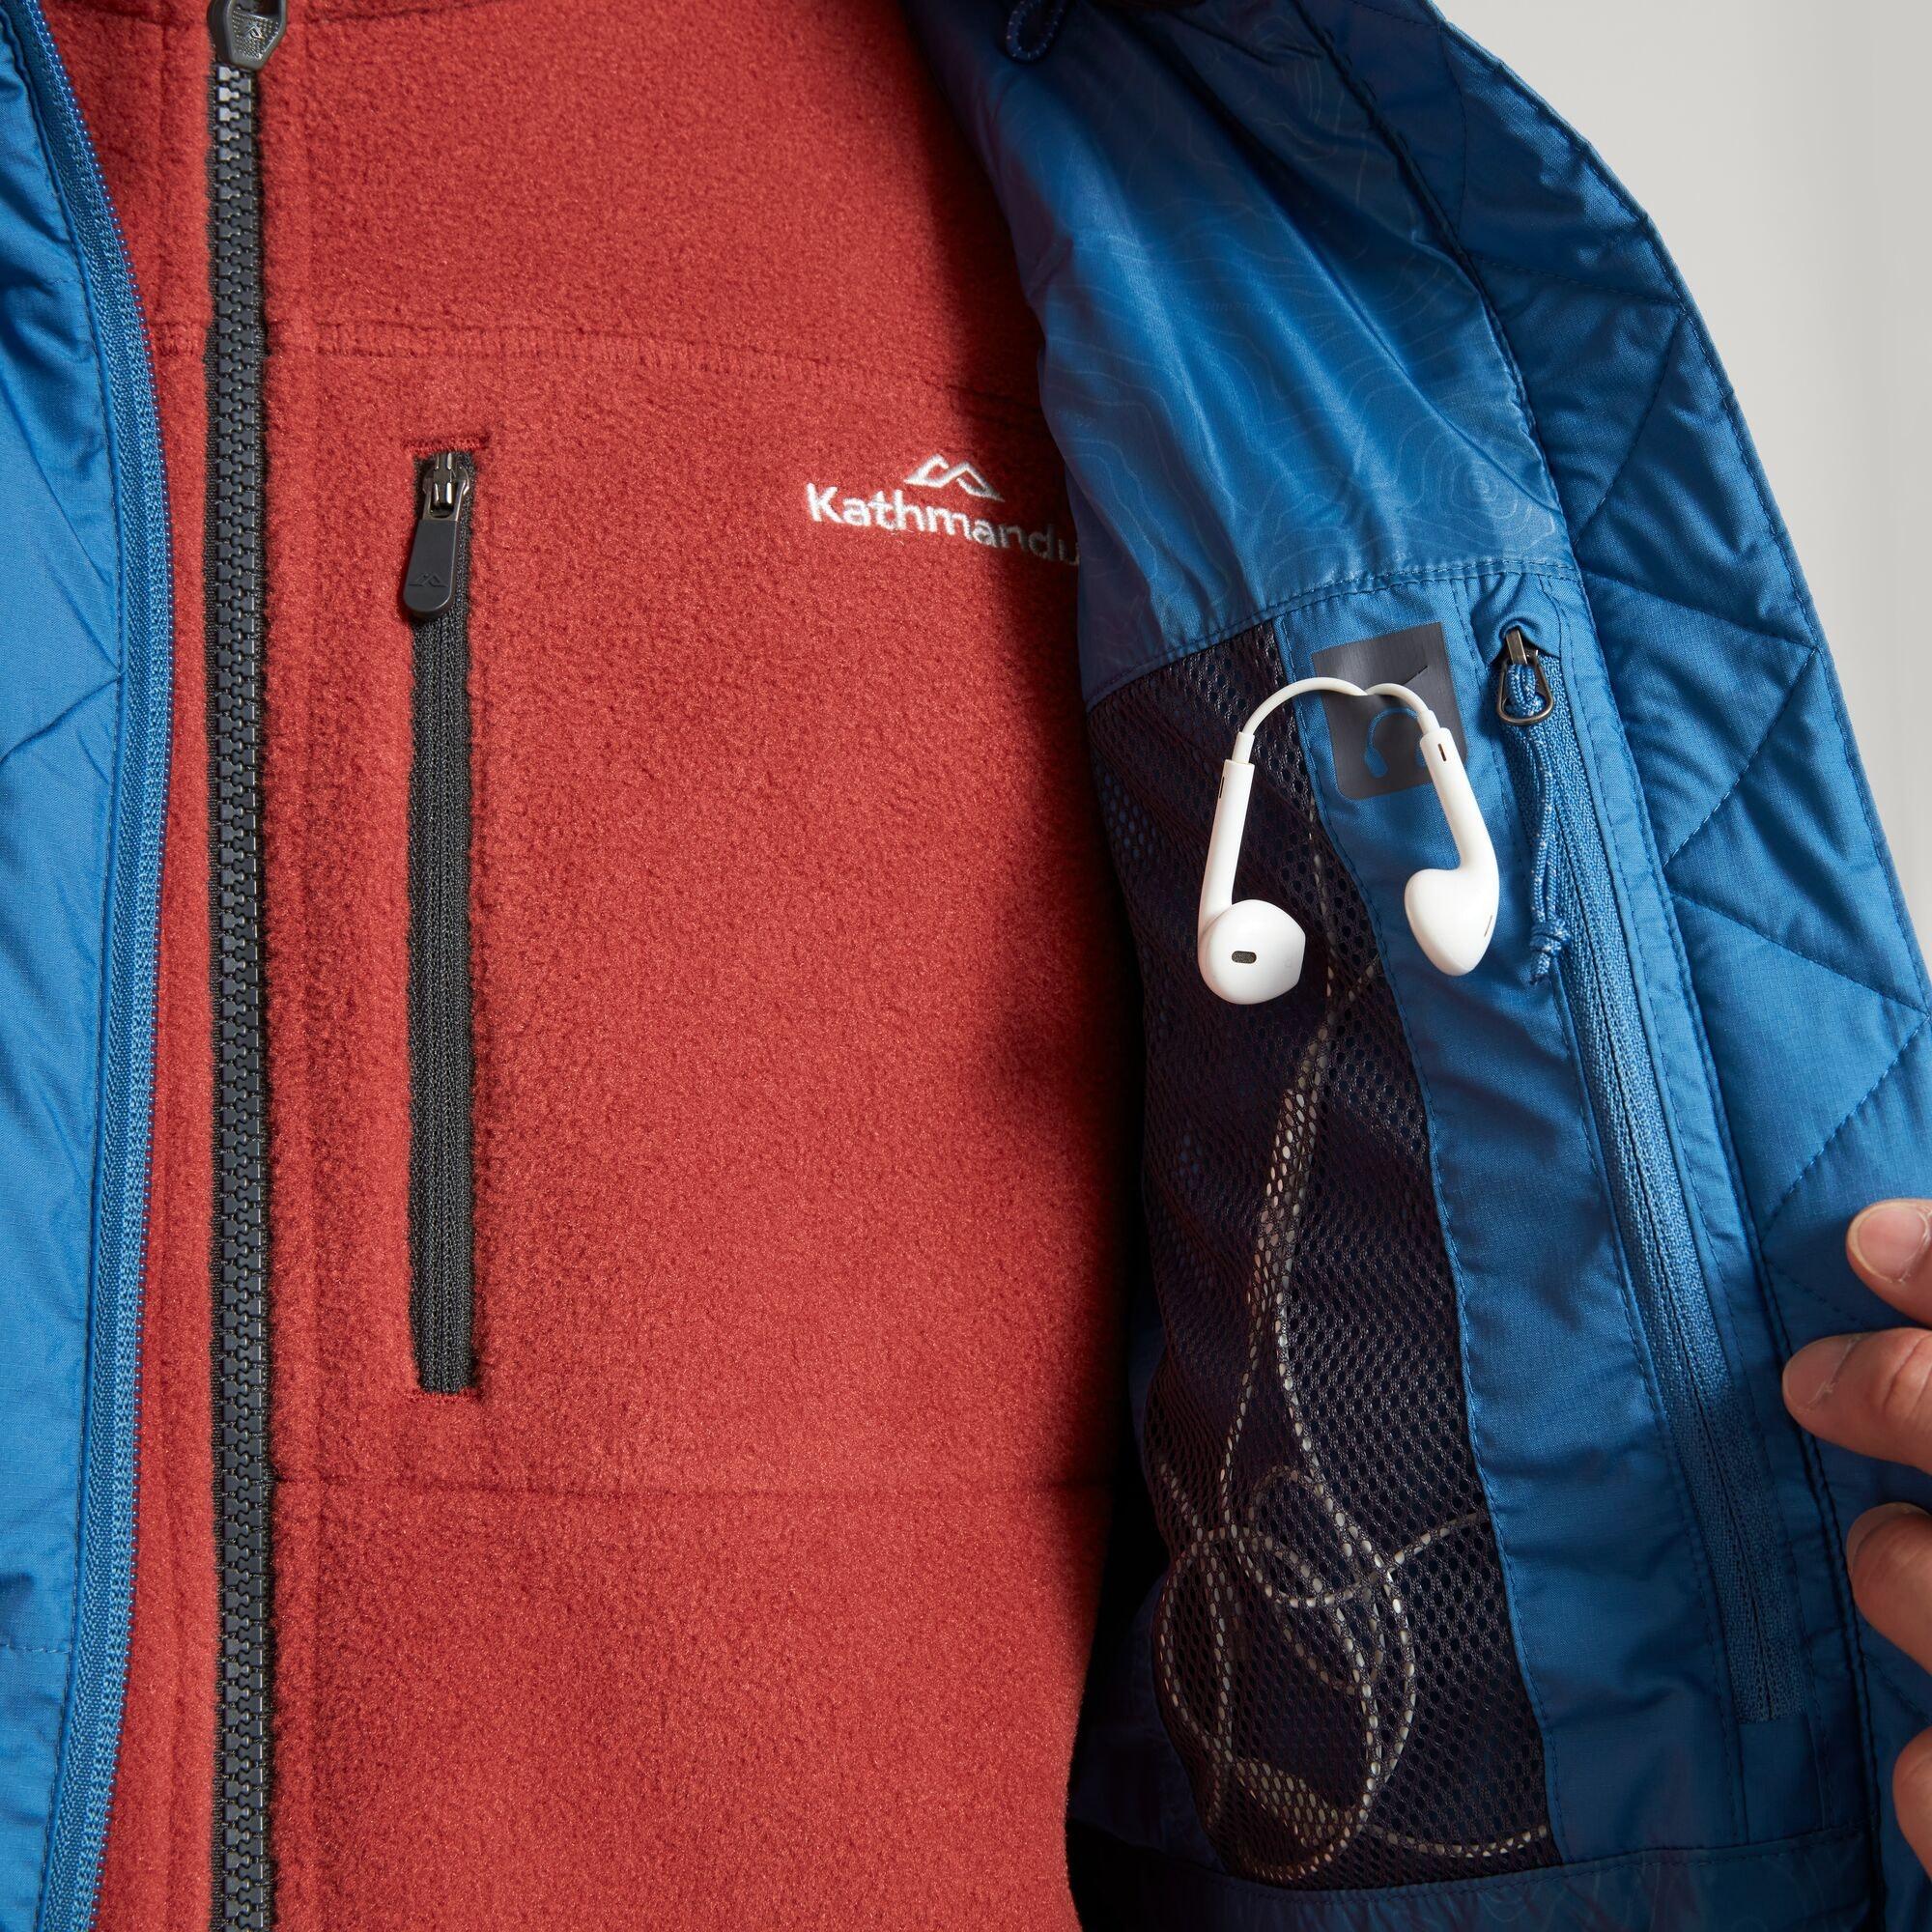 thumbnail 25 - NEW Kathmandu Epiq Mens 600 Fill Down Puffer Warm Outdoor Winter Jacket